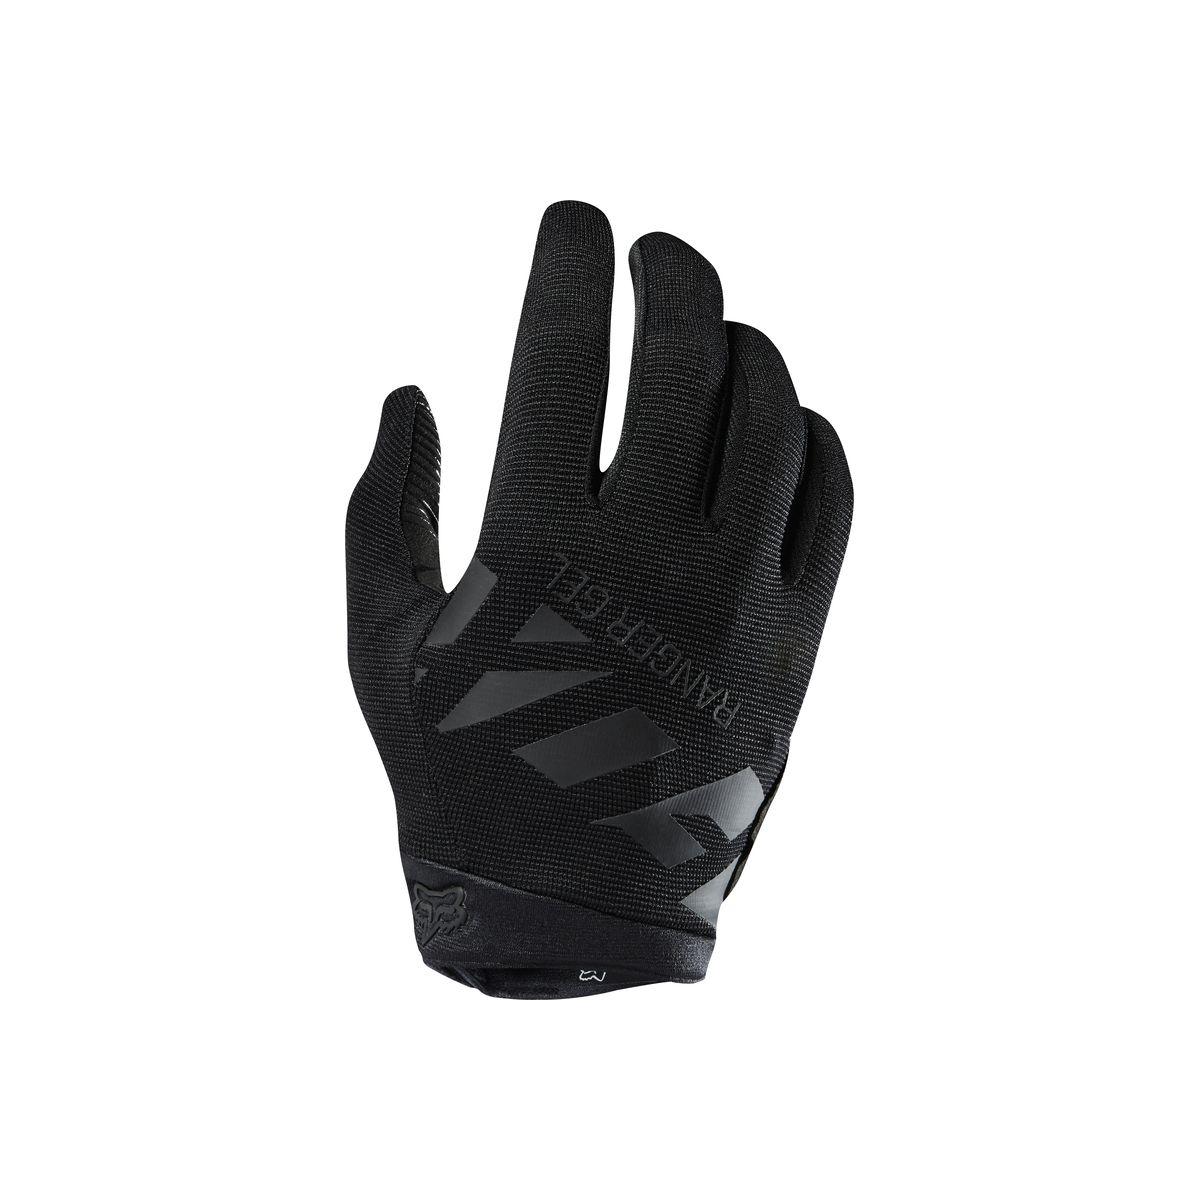 Rękawiczki Fox Ranger Gel Black / Black